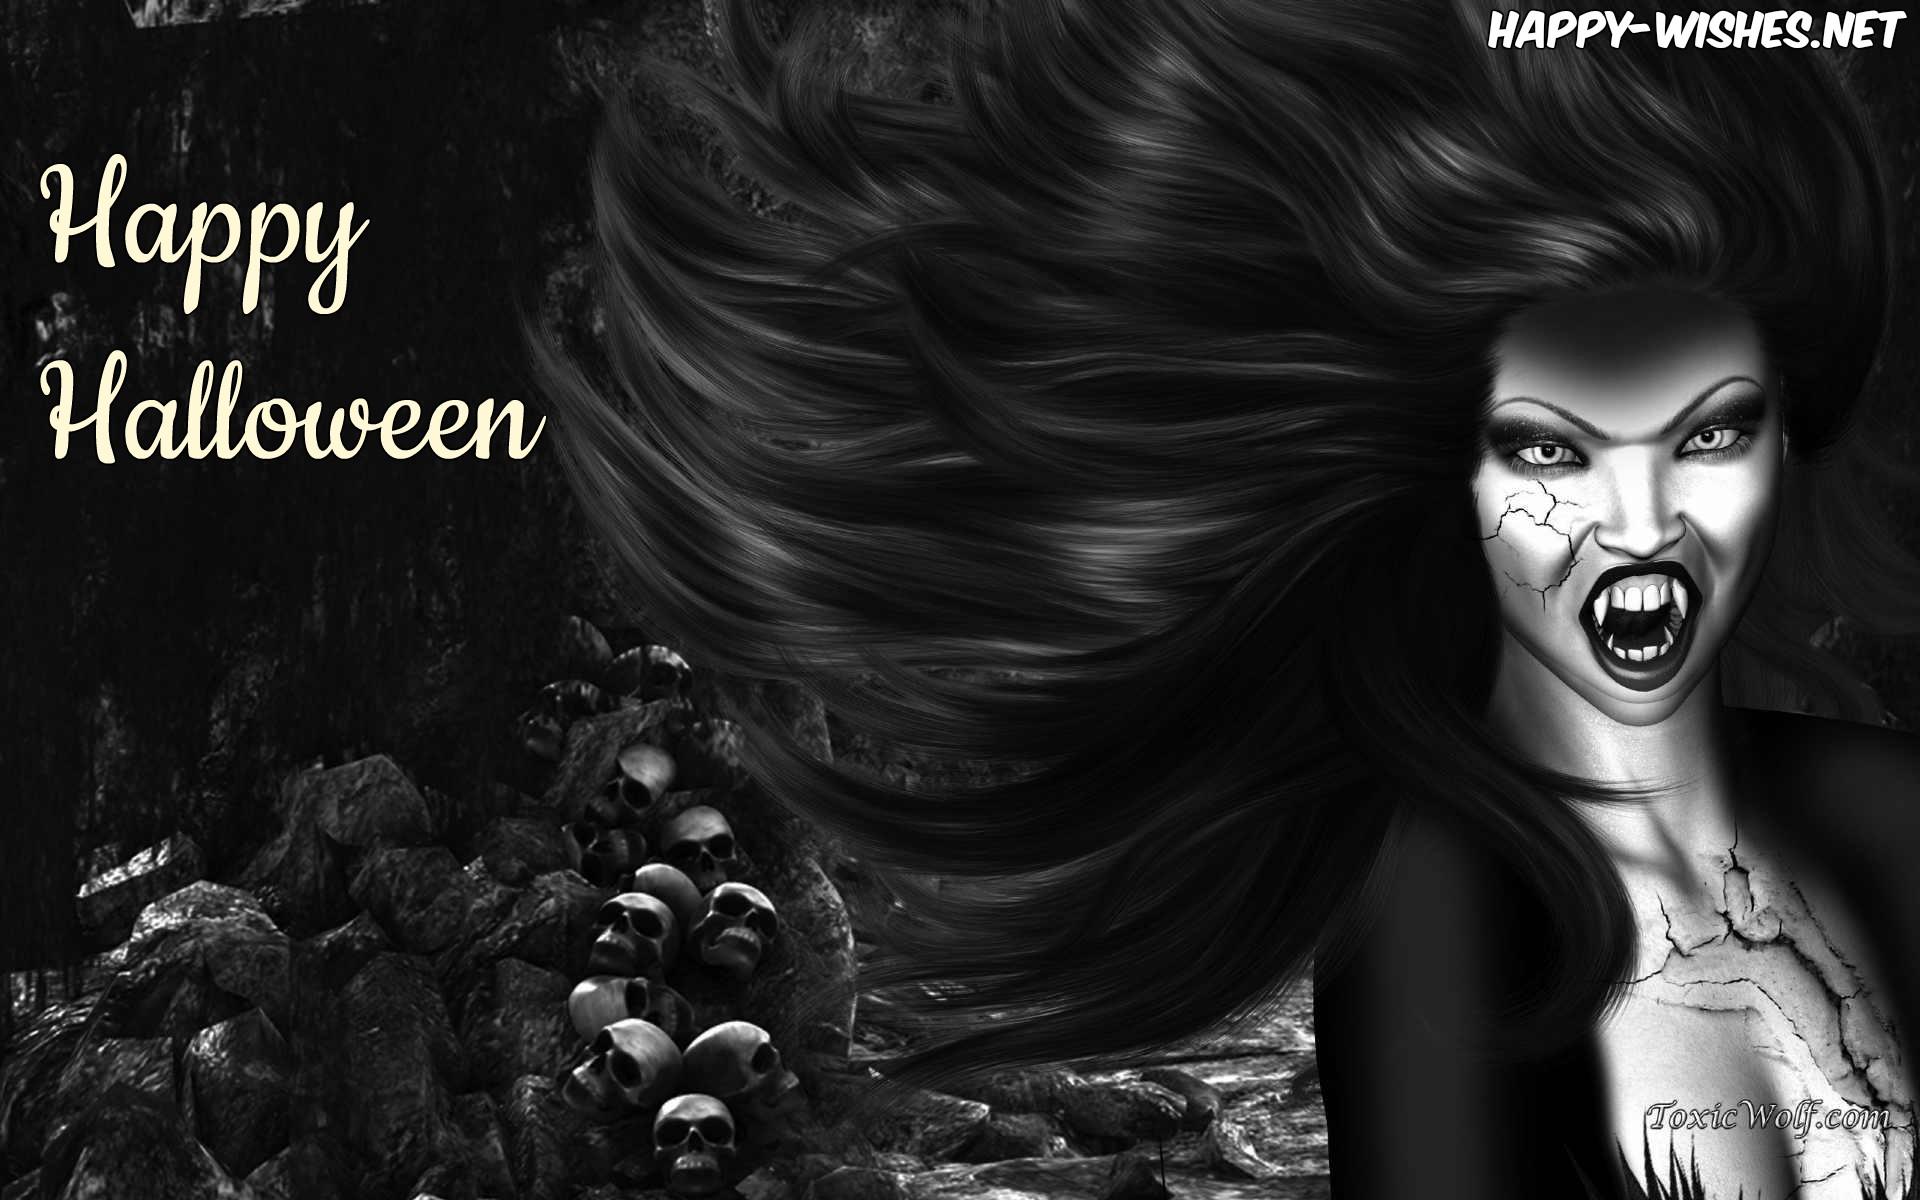 Scary Women Halloween Image